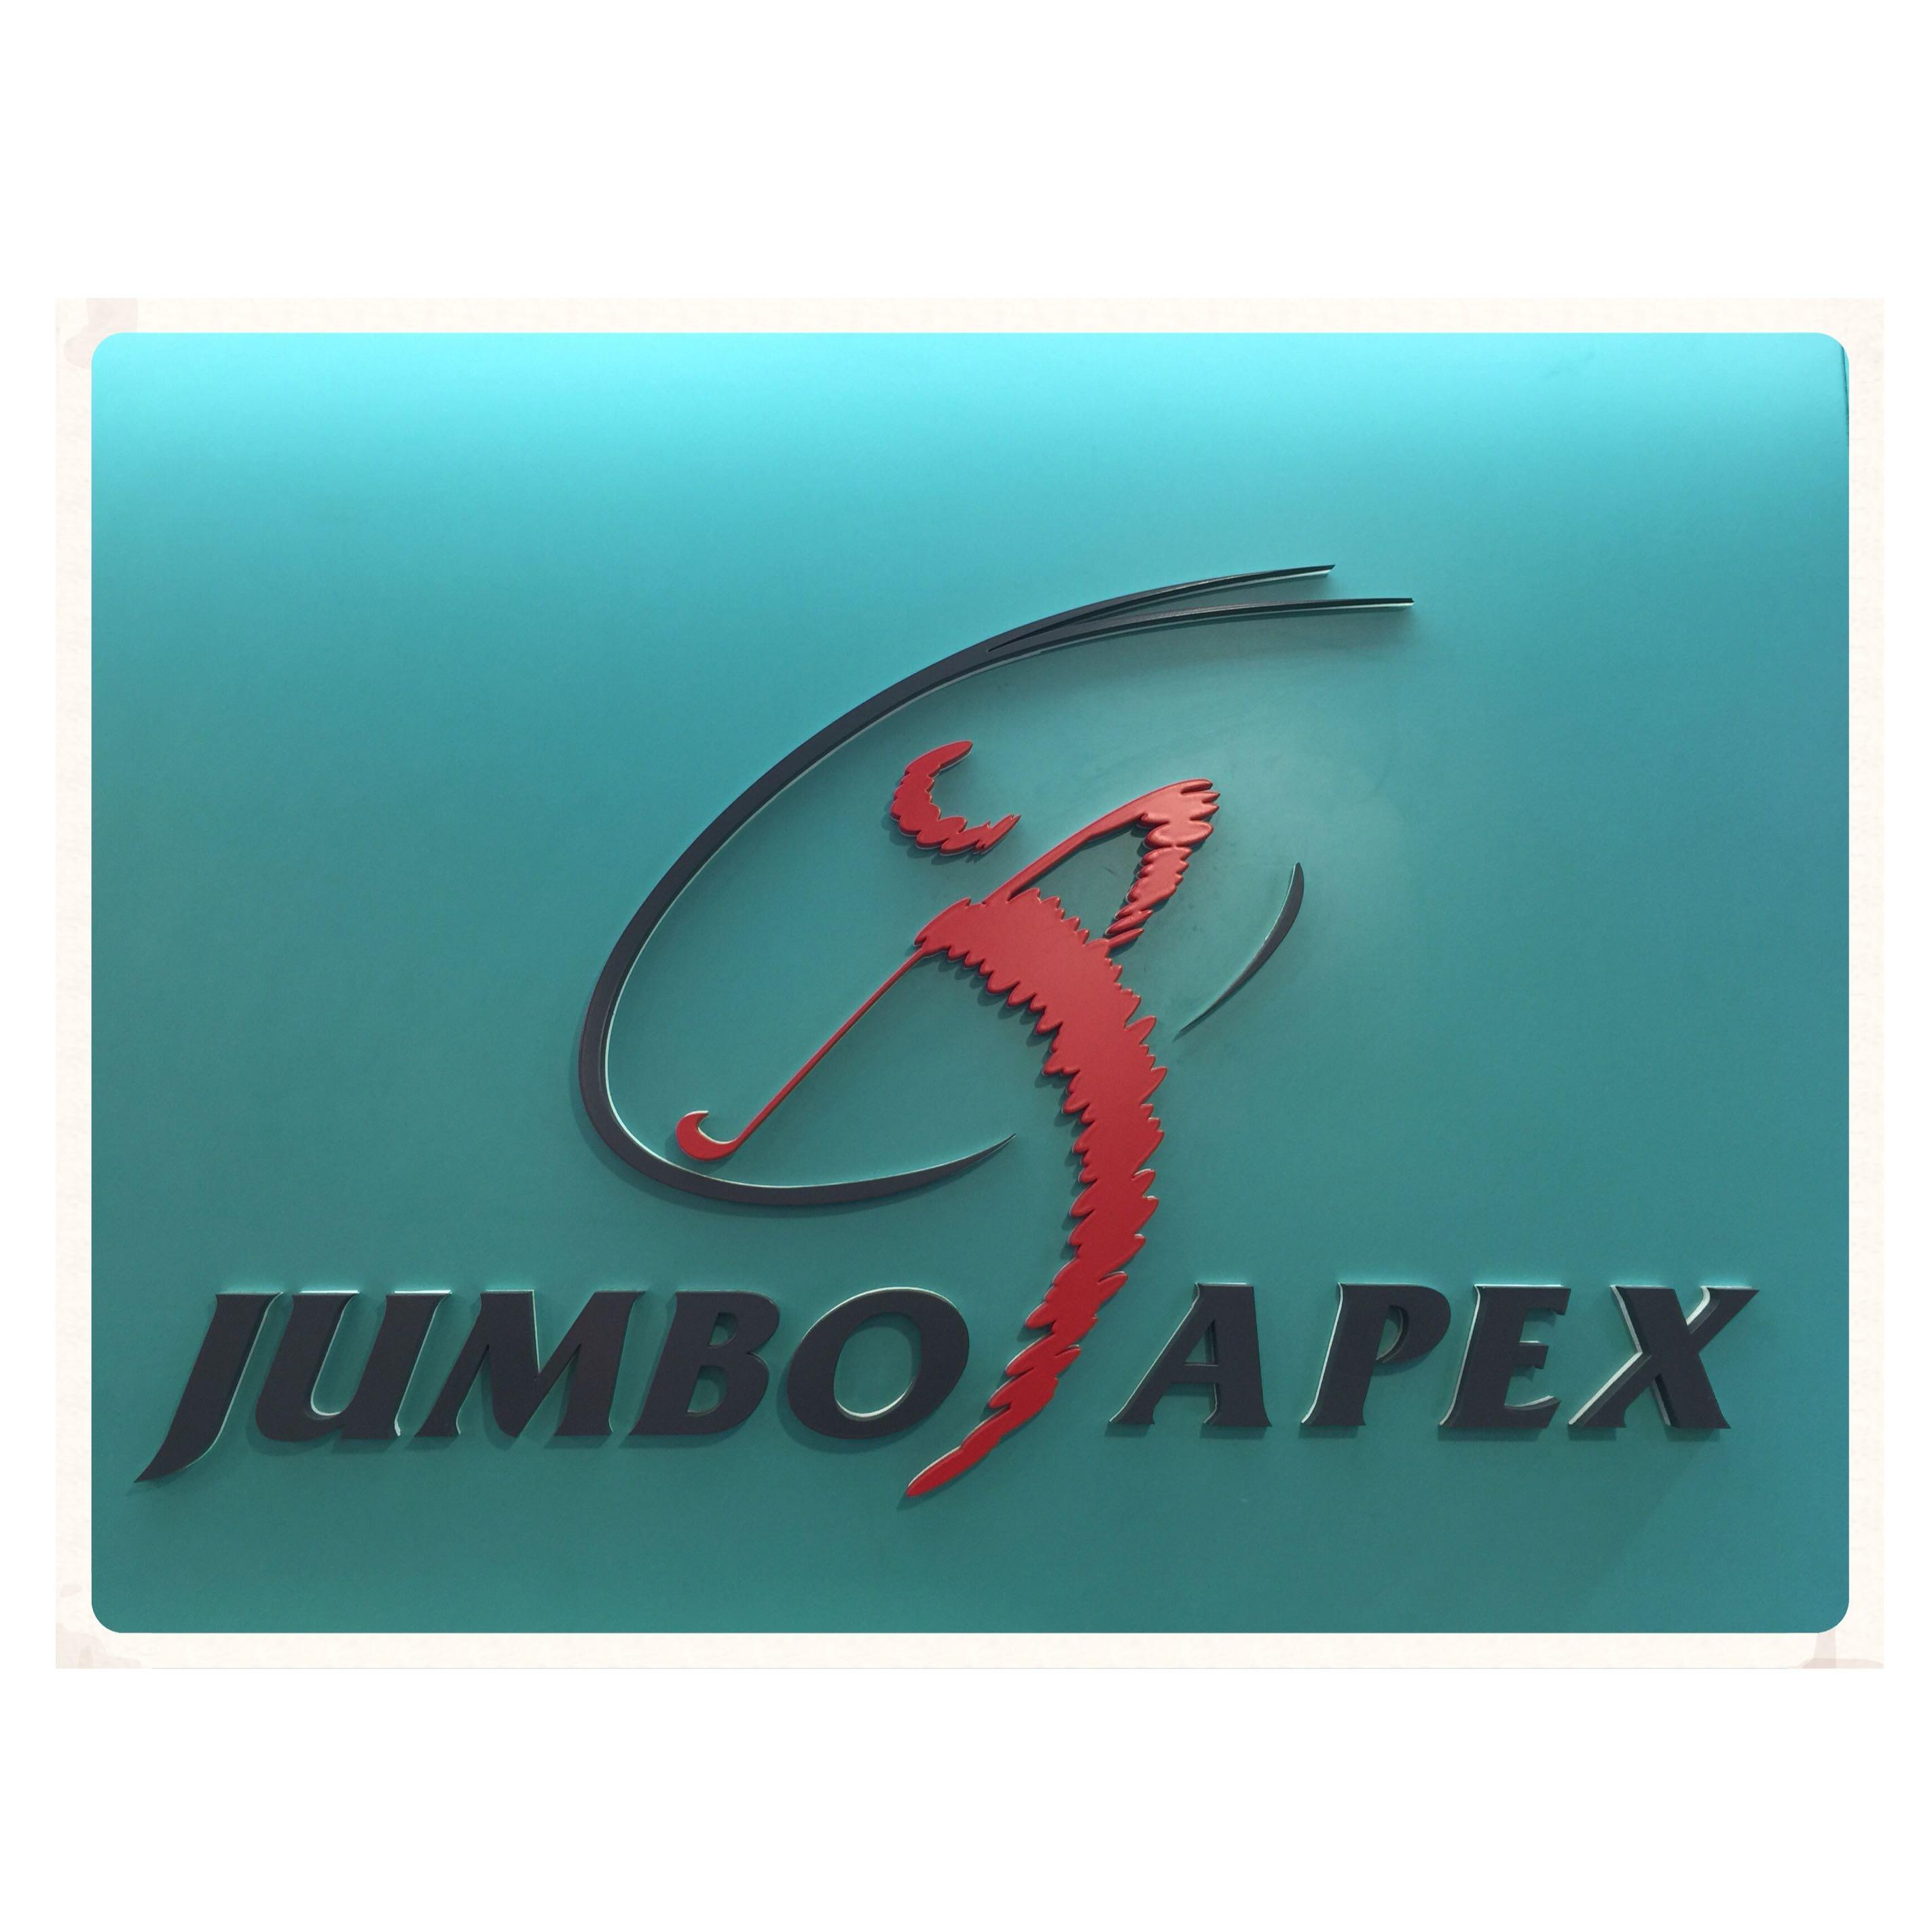 jumboapex